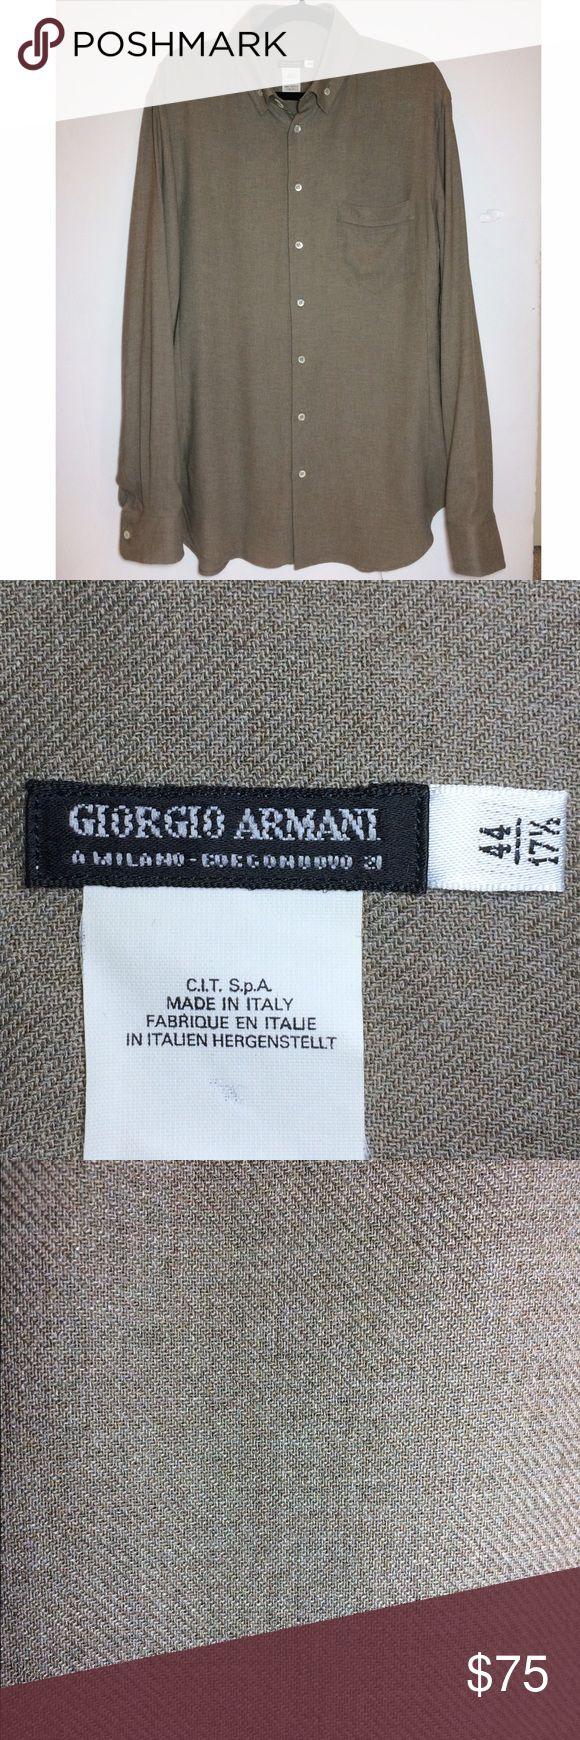 "Giorgio Armani Shirt Khaki/tan button dress shirt.  Gorgeous and in perfect condition!  High quality viscose woven fabric. Size 44/17.5 Neck. 32.5"" long. No trades. Giorgio Armani Shirts"